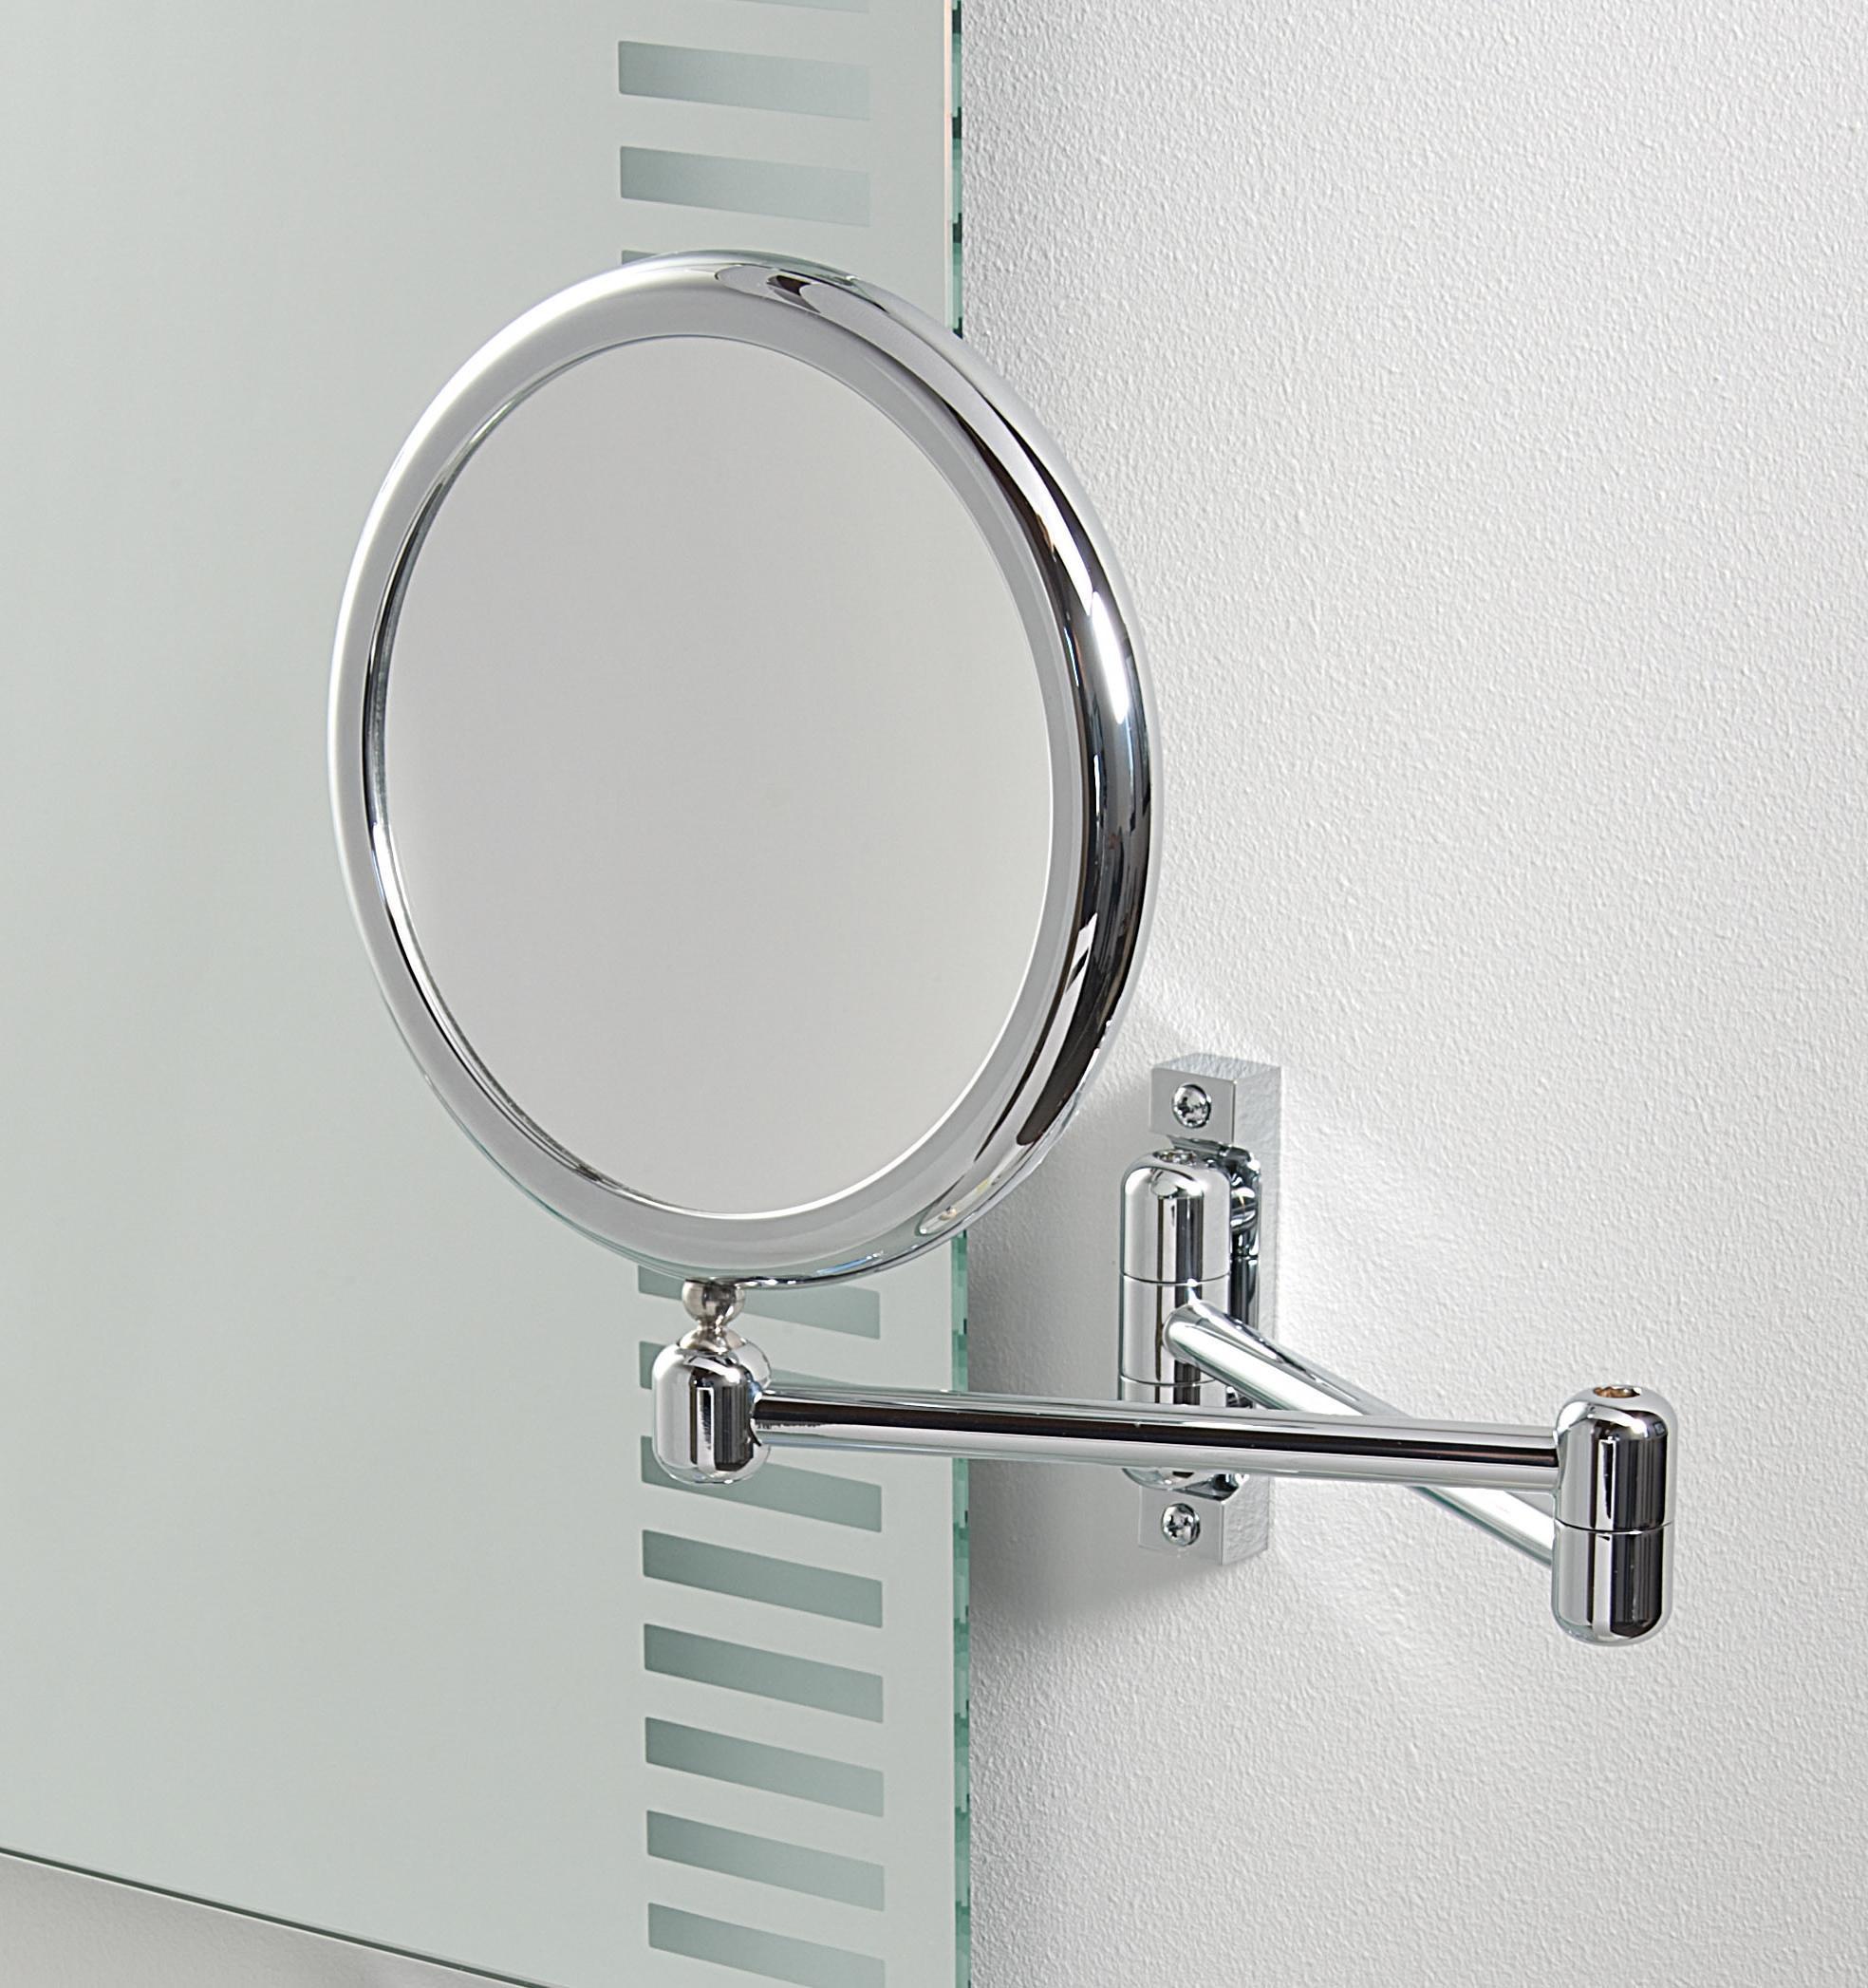 koh i noor discolo led vergr erungsspiegel 3 fache vergr erung 230 x 460 mm chrom c35 2kk3. Black Bedroom Furniture Sets. Home Design Ideas